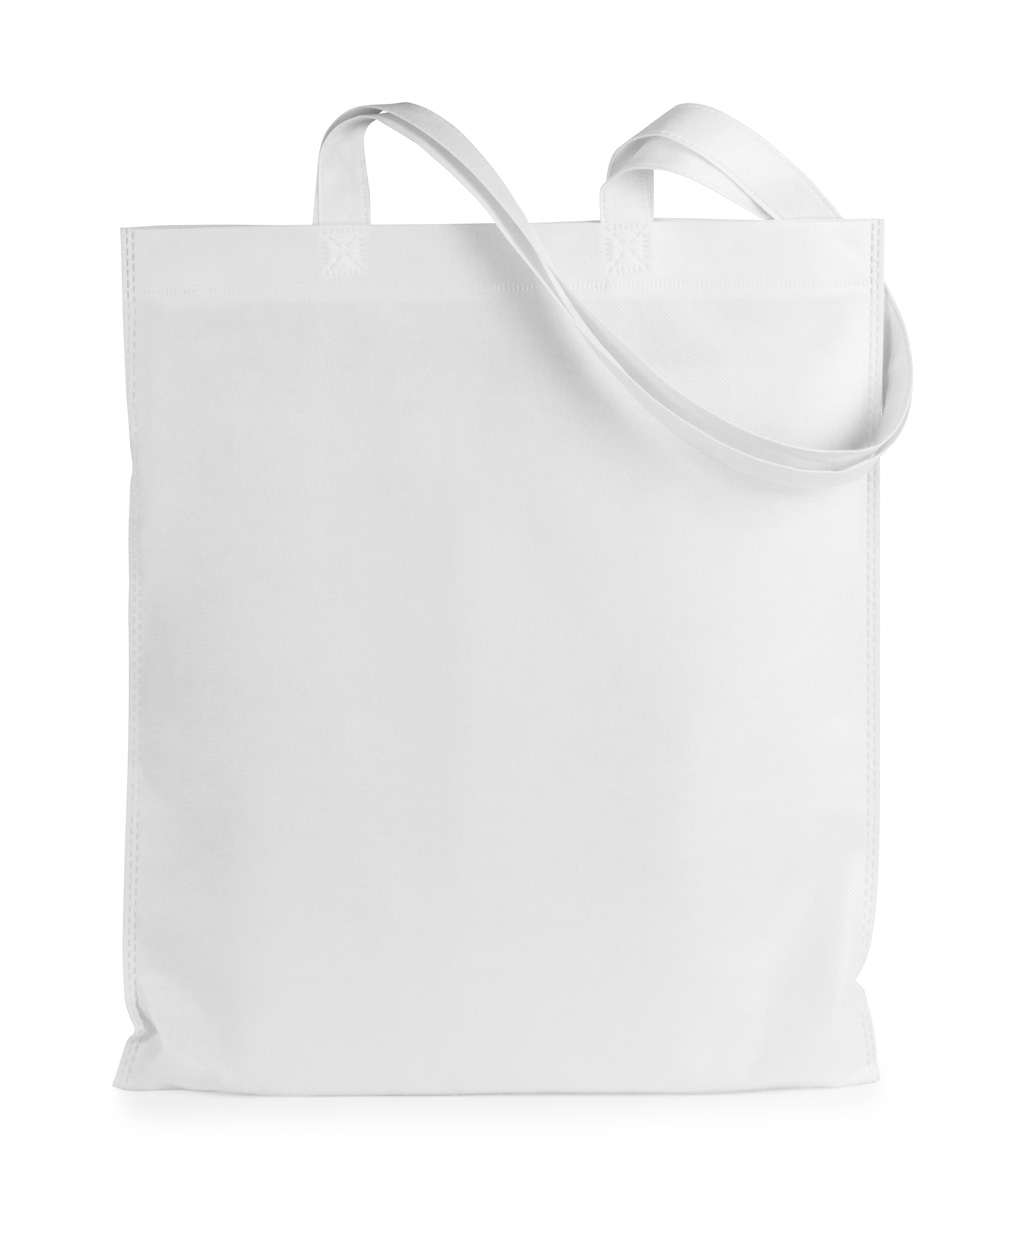 Jazzin shopping bag